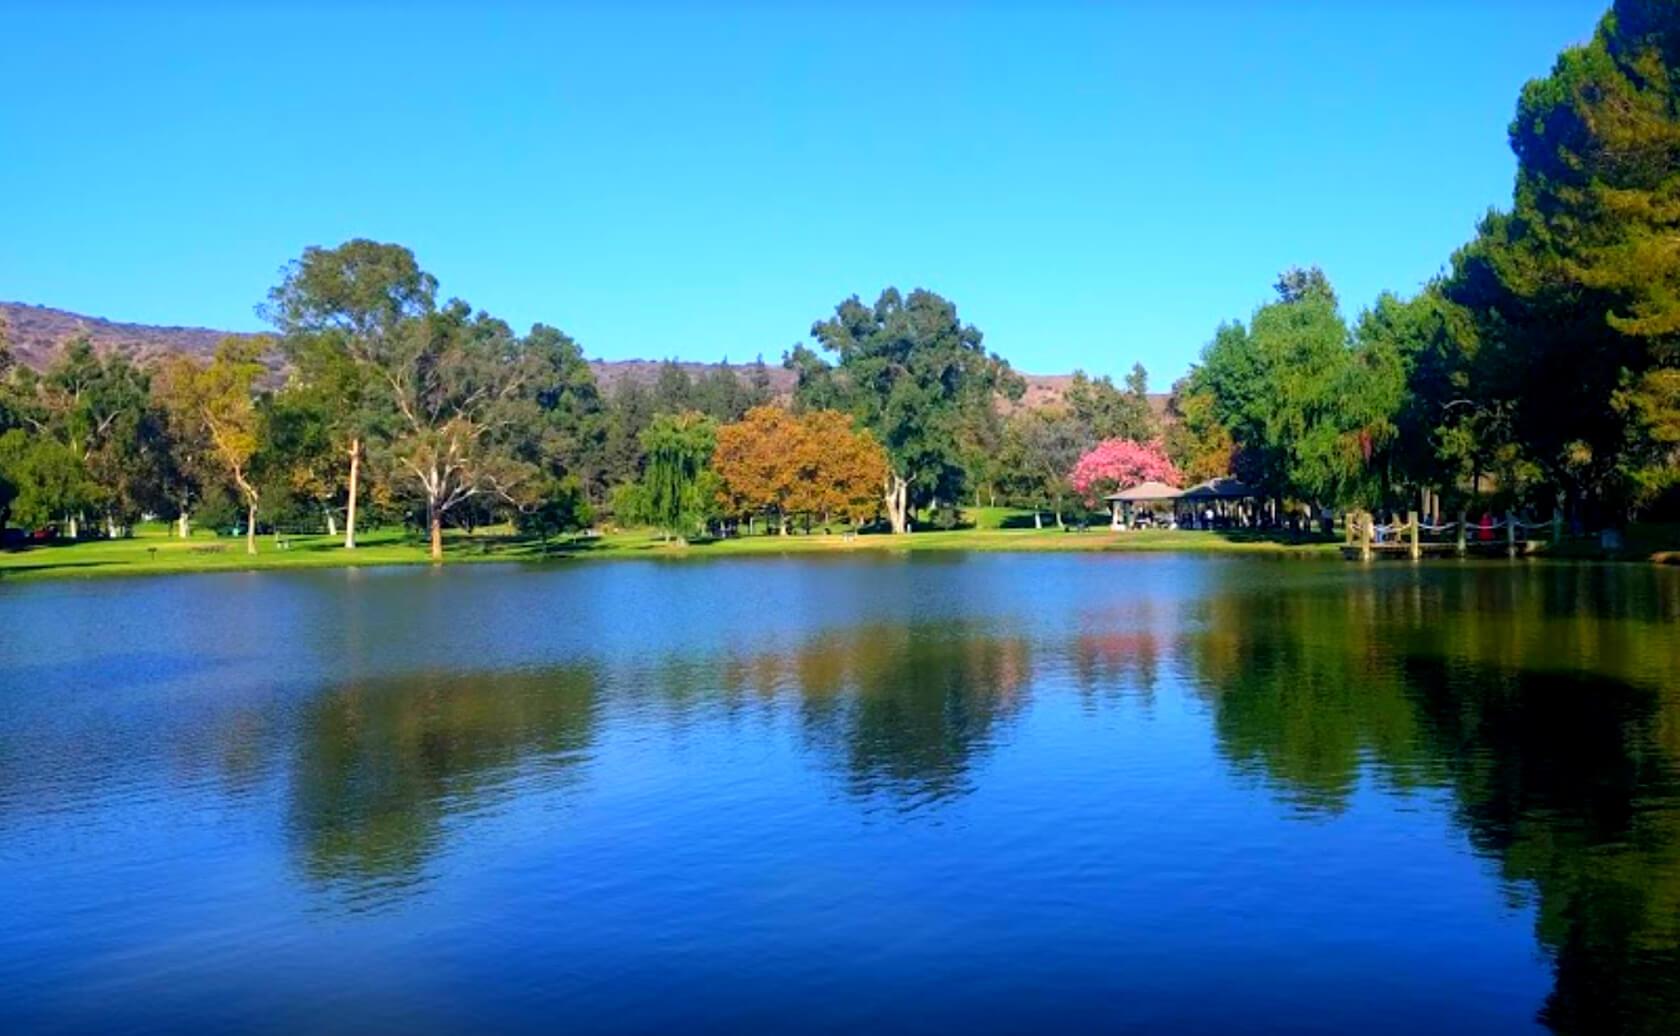 Carbon-Canyon-Park-Lake-Fishing-Guide-Report-Brea-CA-03